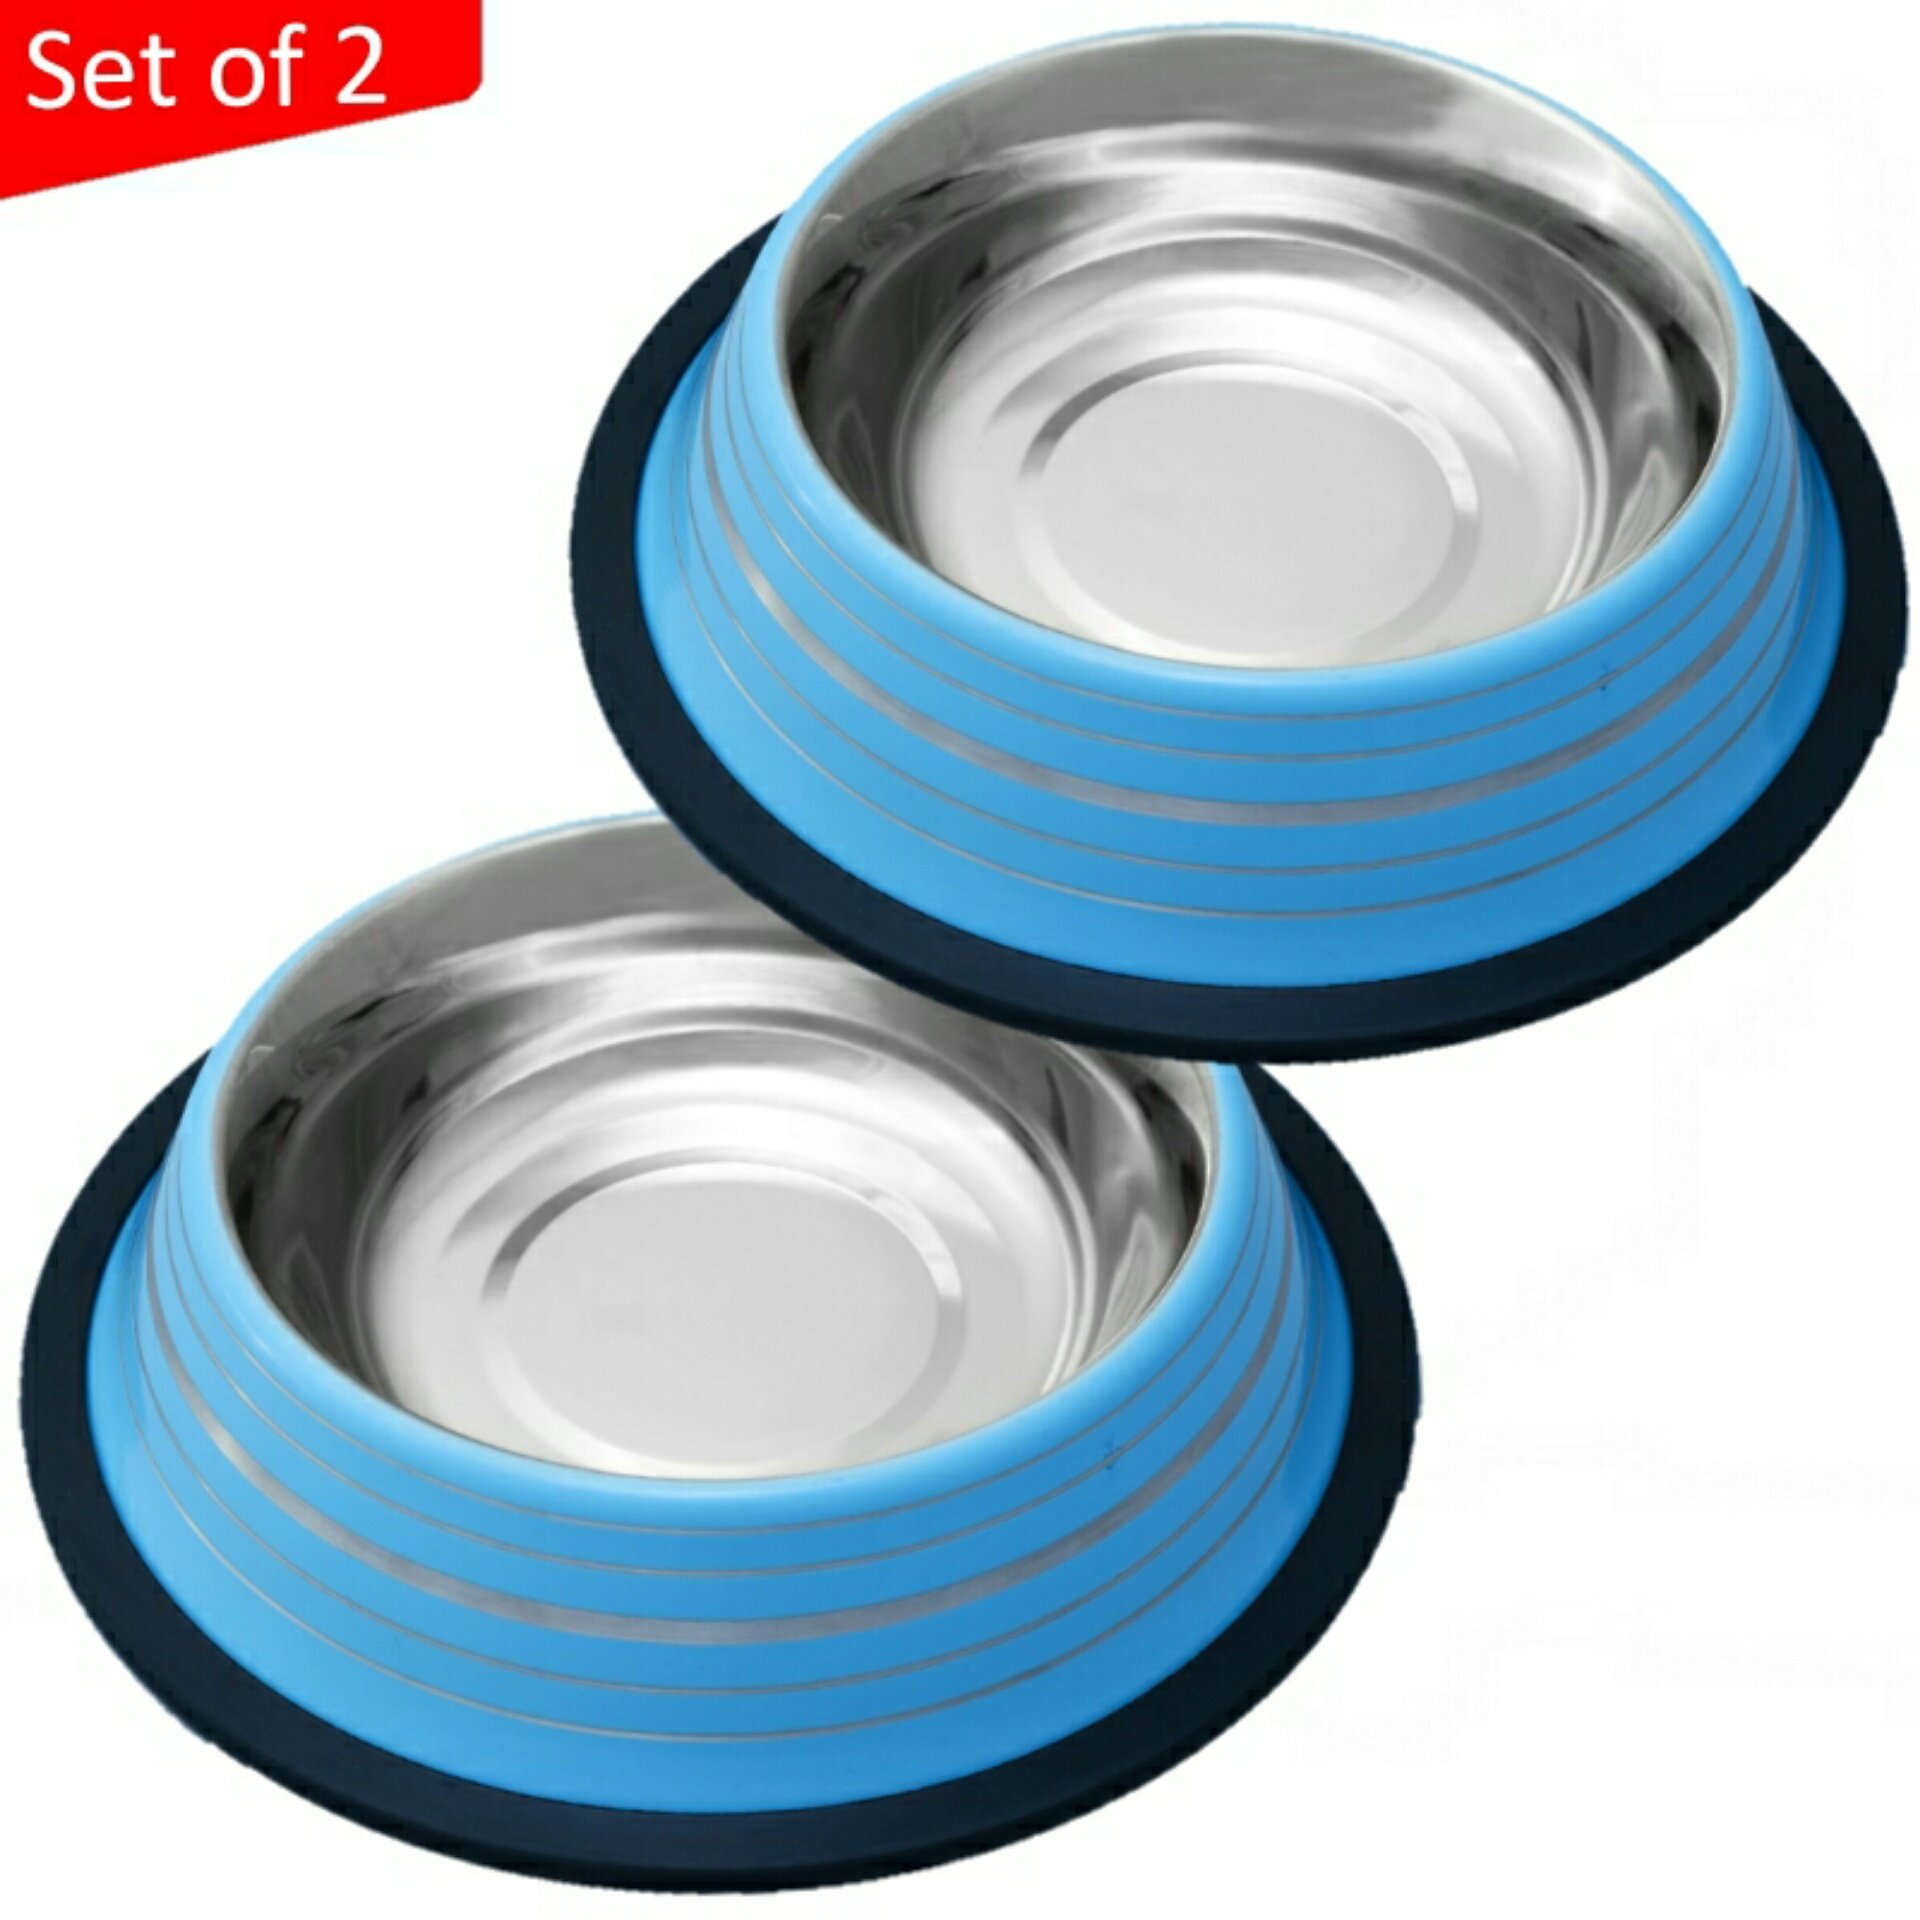 Mr. Peanut's Set of 2 48oz Blue Painted Food Grade Stainless Steel Dog Bowls ...